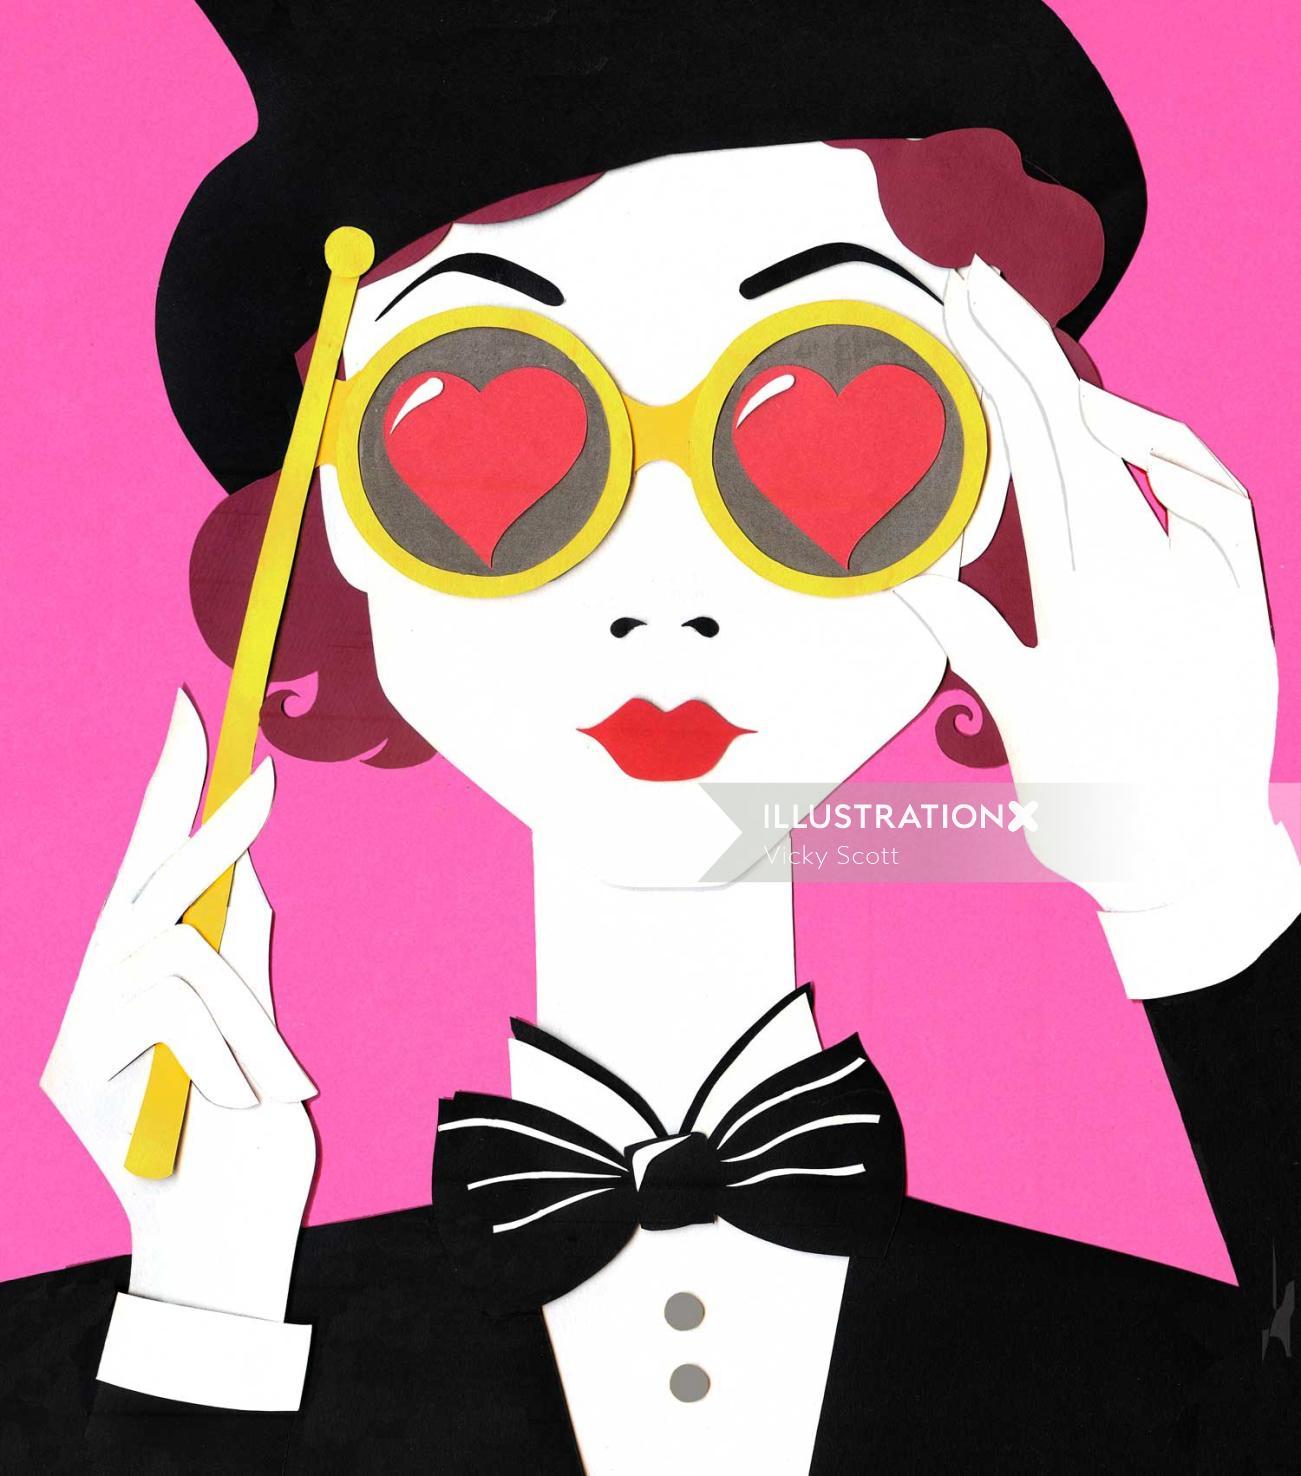 opera glasses, silhouette, lady, suit, bow tie, heart, top hat, greta garbo, lady, 1930's, retro